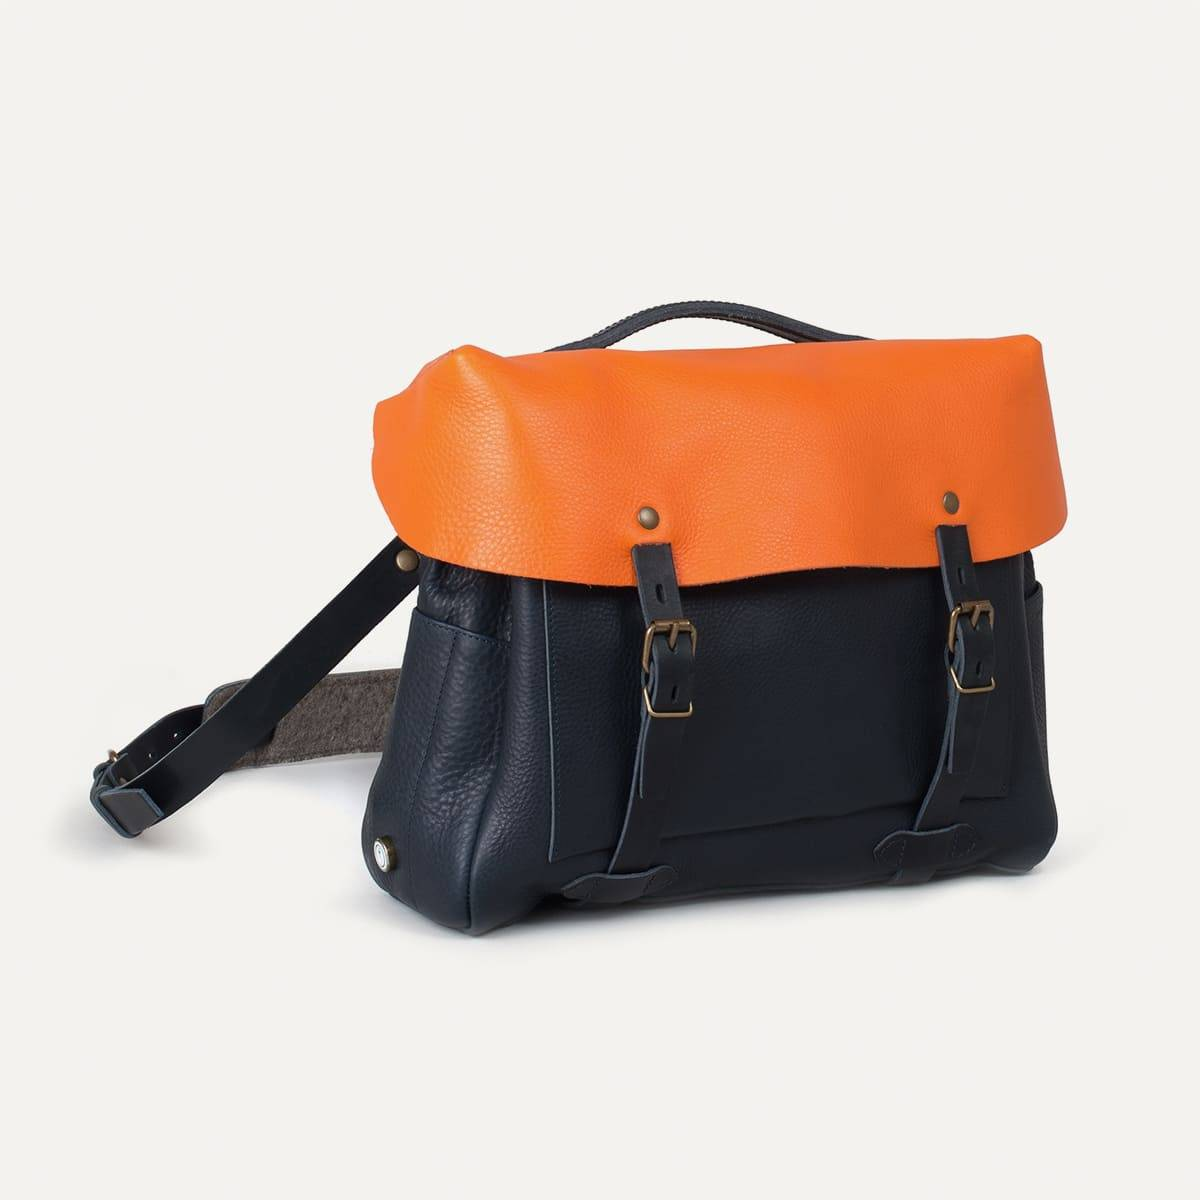 Bleu de Chauffe x Blitz Eclair bag - Navy/Orange (image n°2)